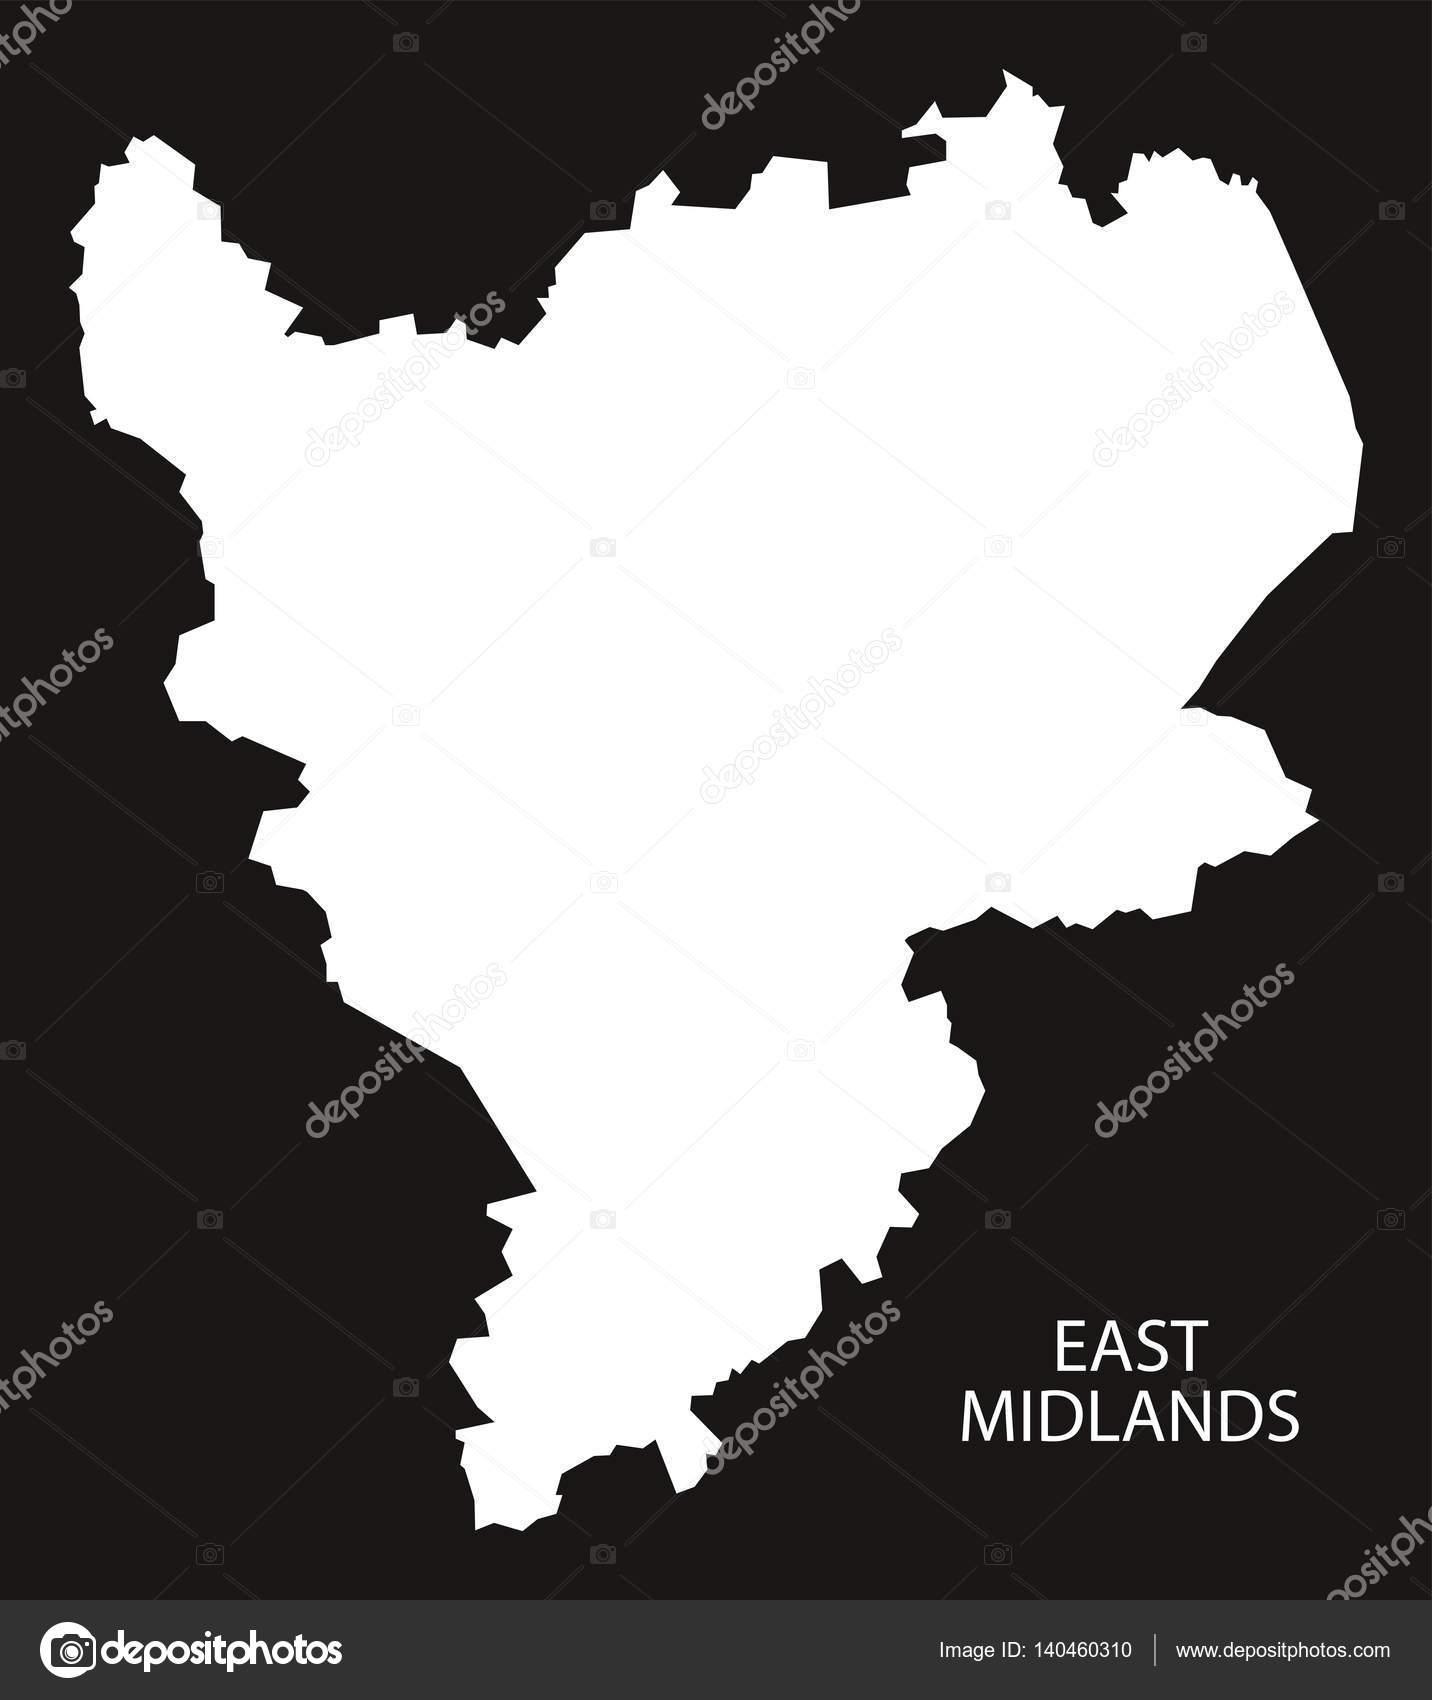 Map Of England Midlands.East Midlands England Map Black Inverted Stock Vector